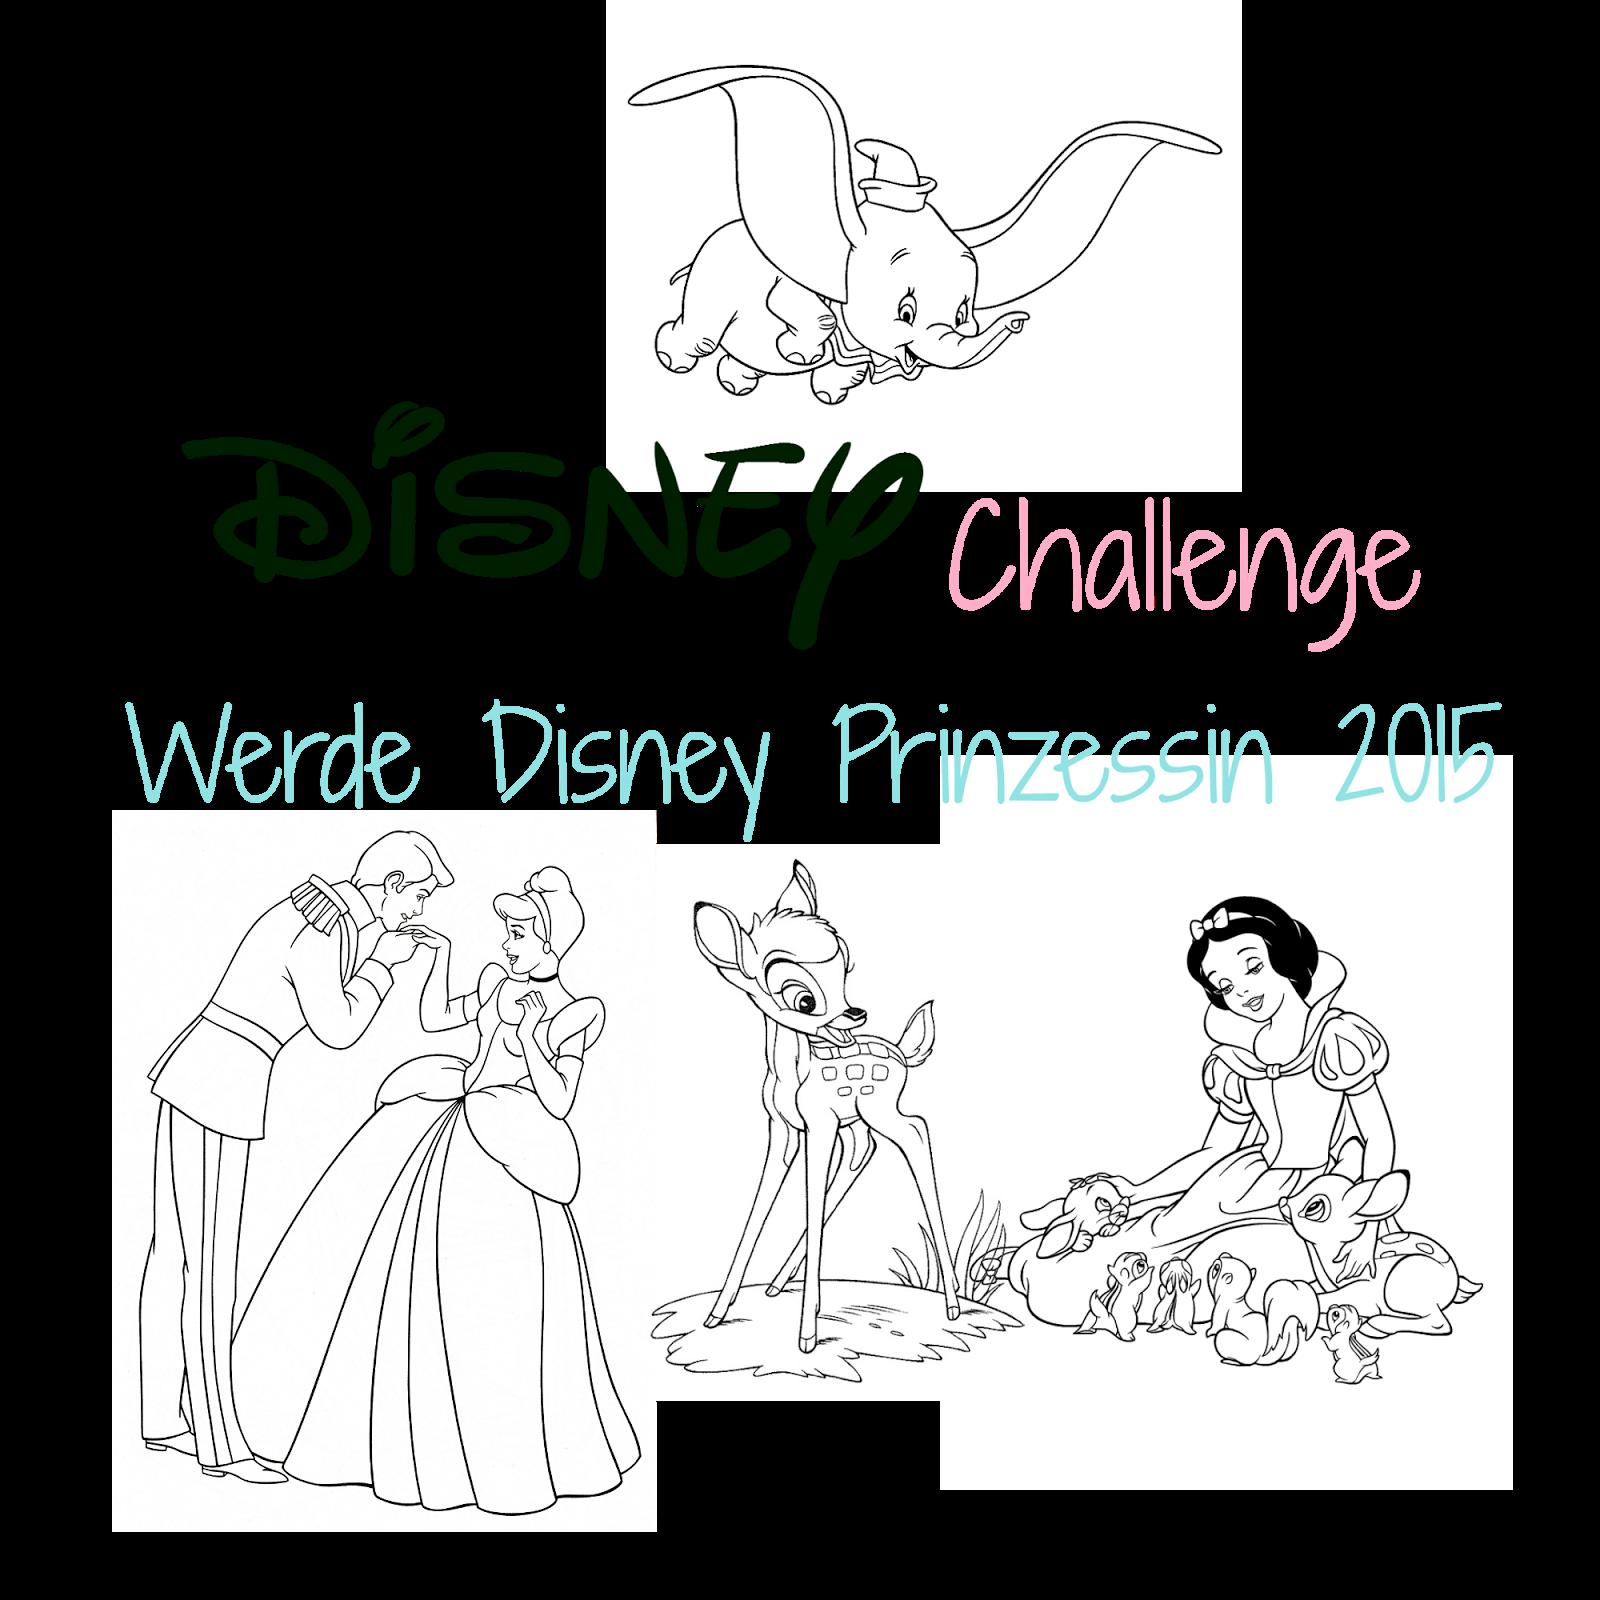 http://sanasbookworlds.blogspot.de/2015/01/challenge-disney-challenge.html